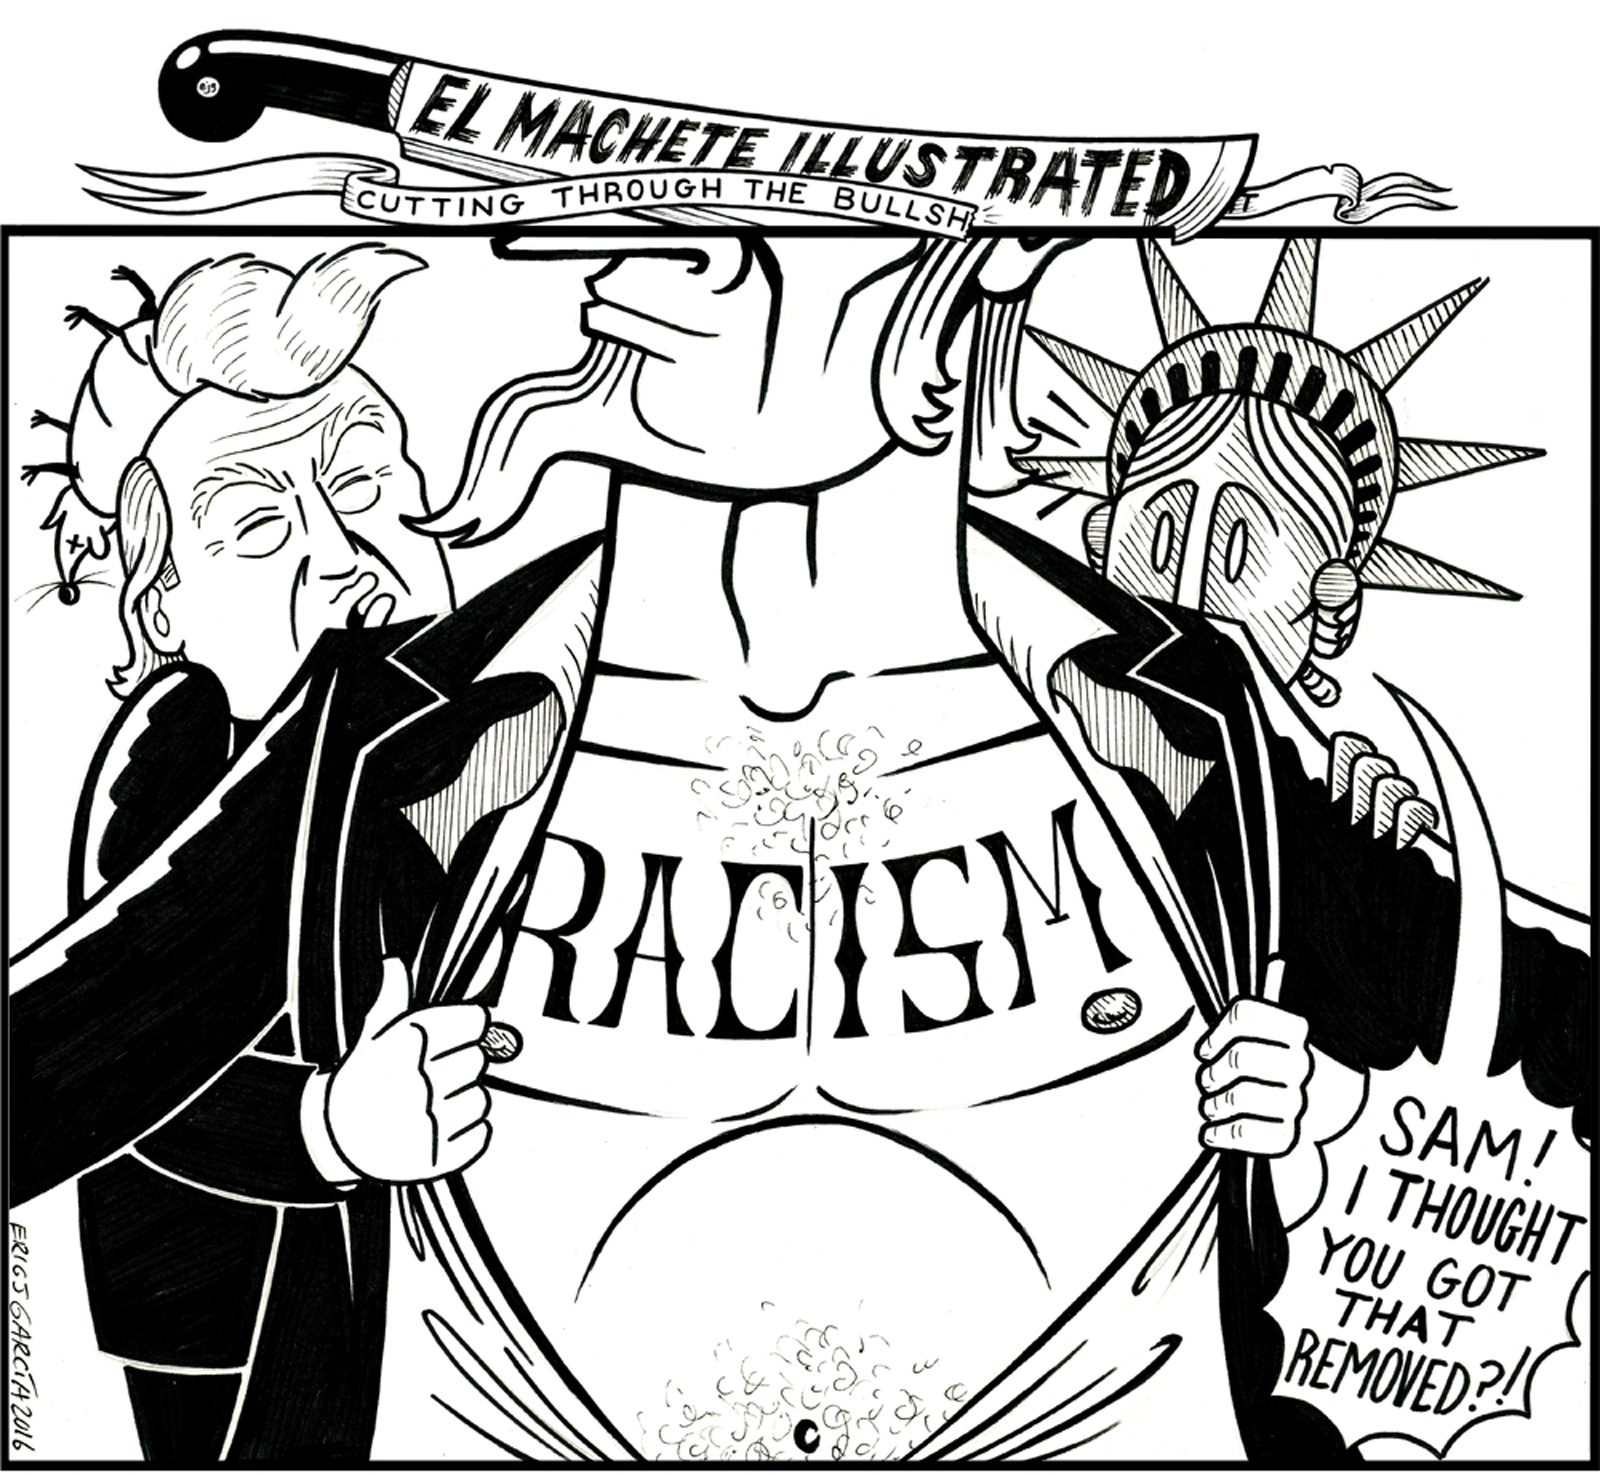 EricJGarcia-%22Exposing Hate%22-2016.jpg